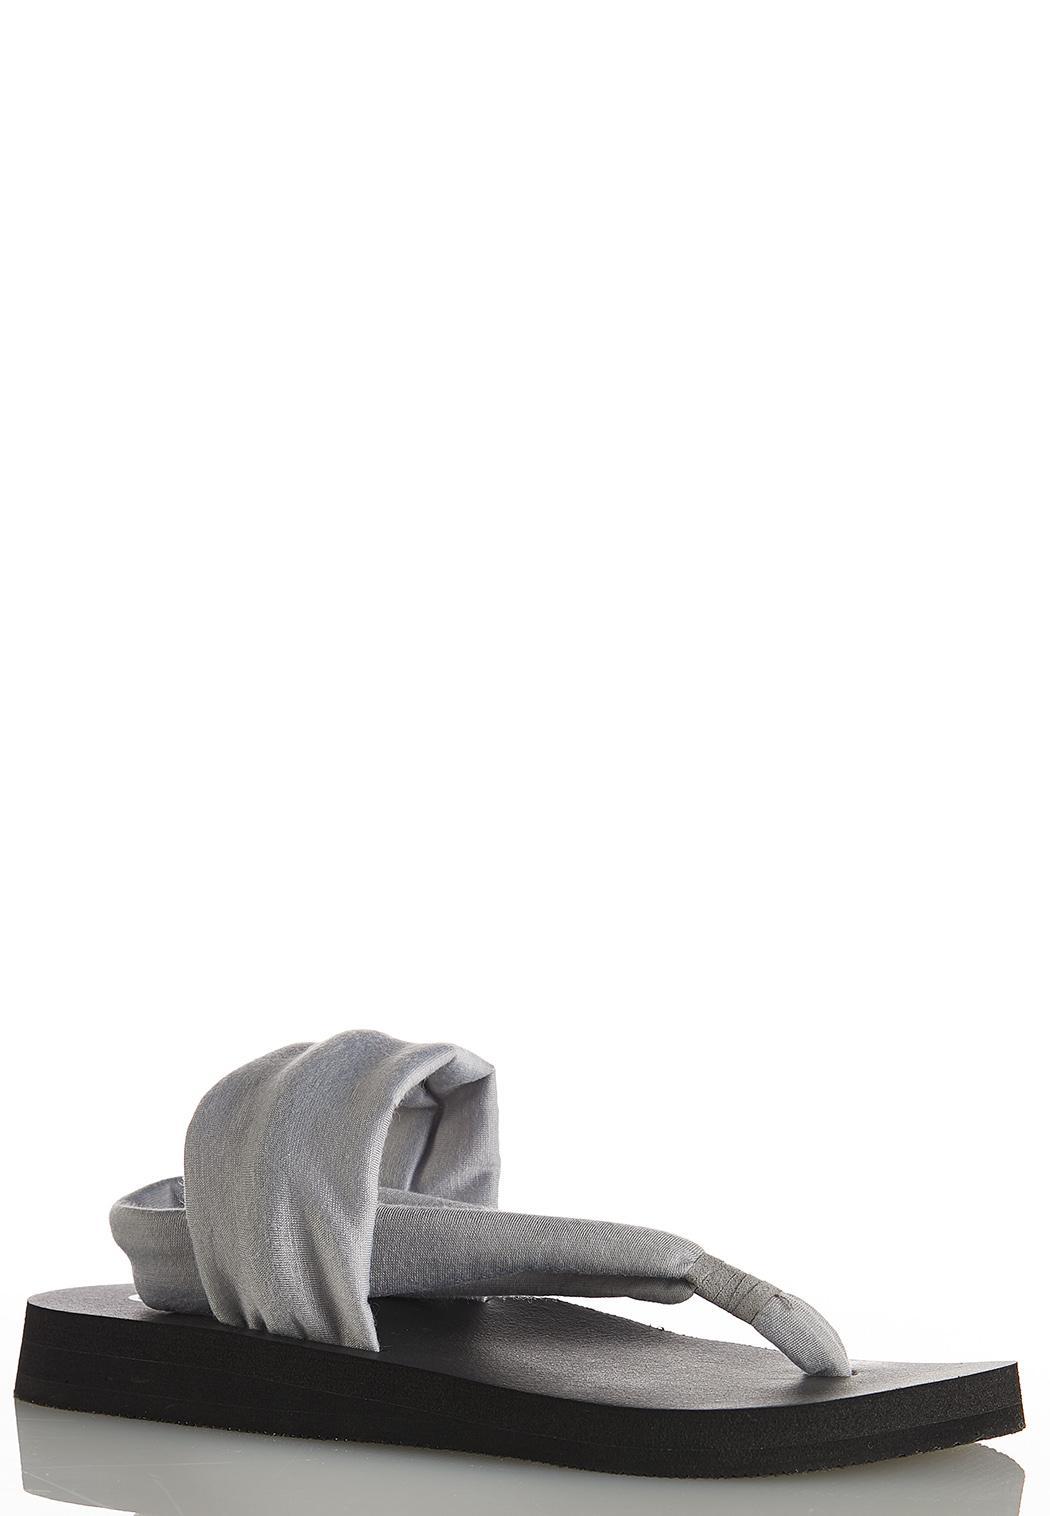 Fabric Band Flip Flops